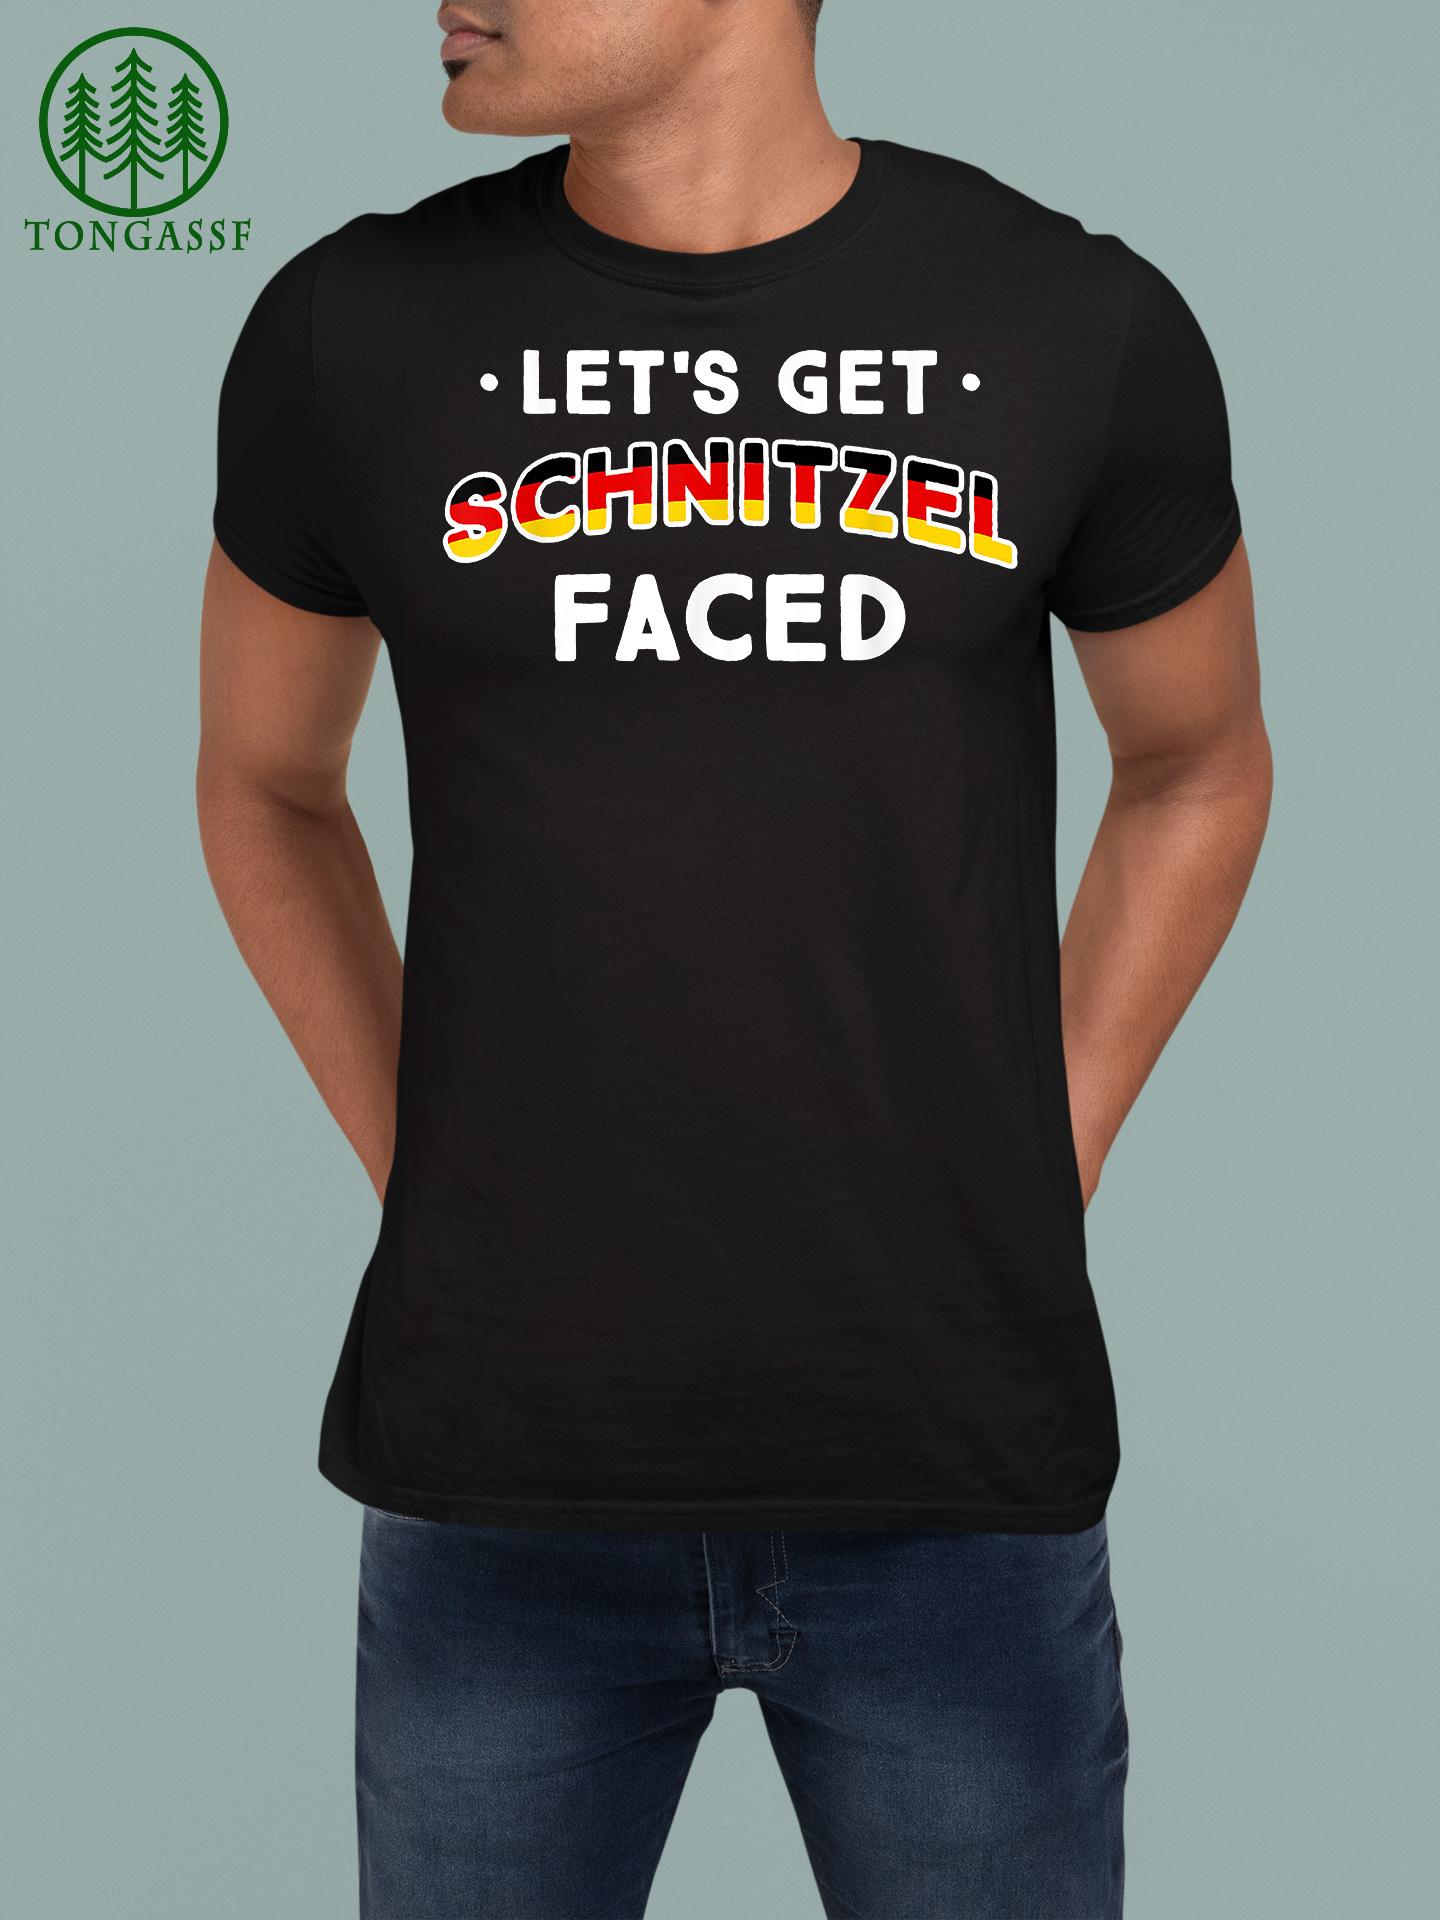 Let's Get Schnitzel Faced Germany Oktoberfest German Shirt